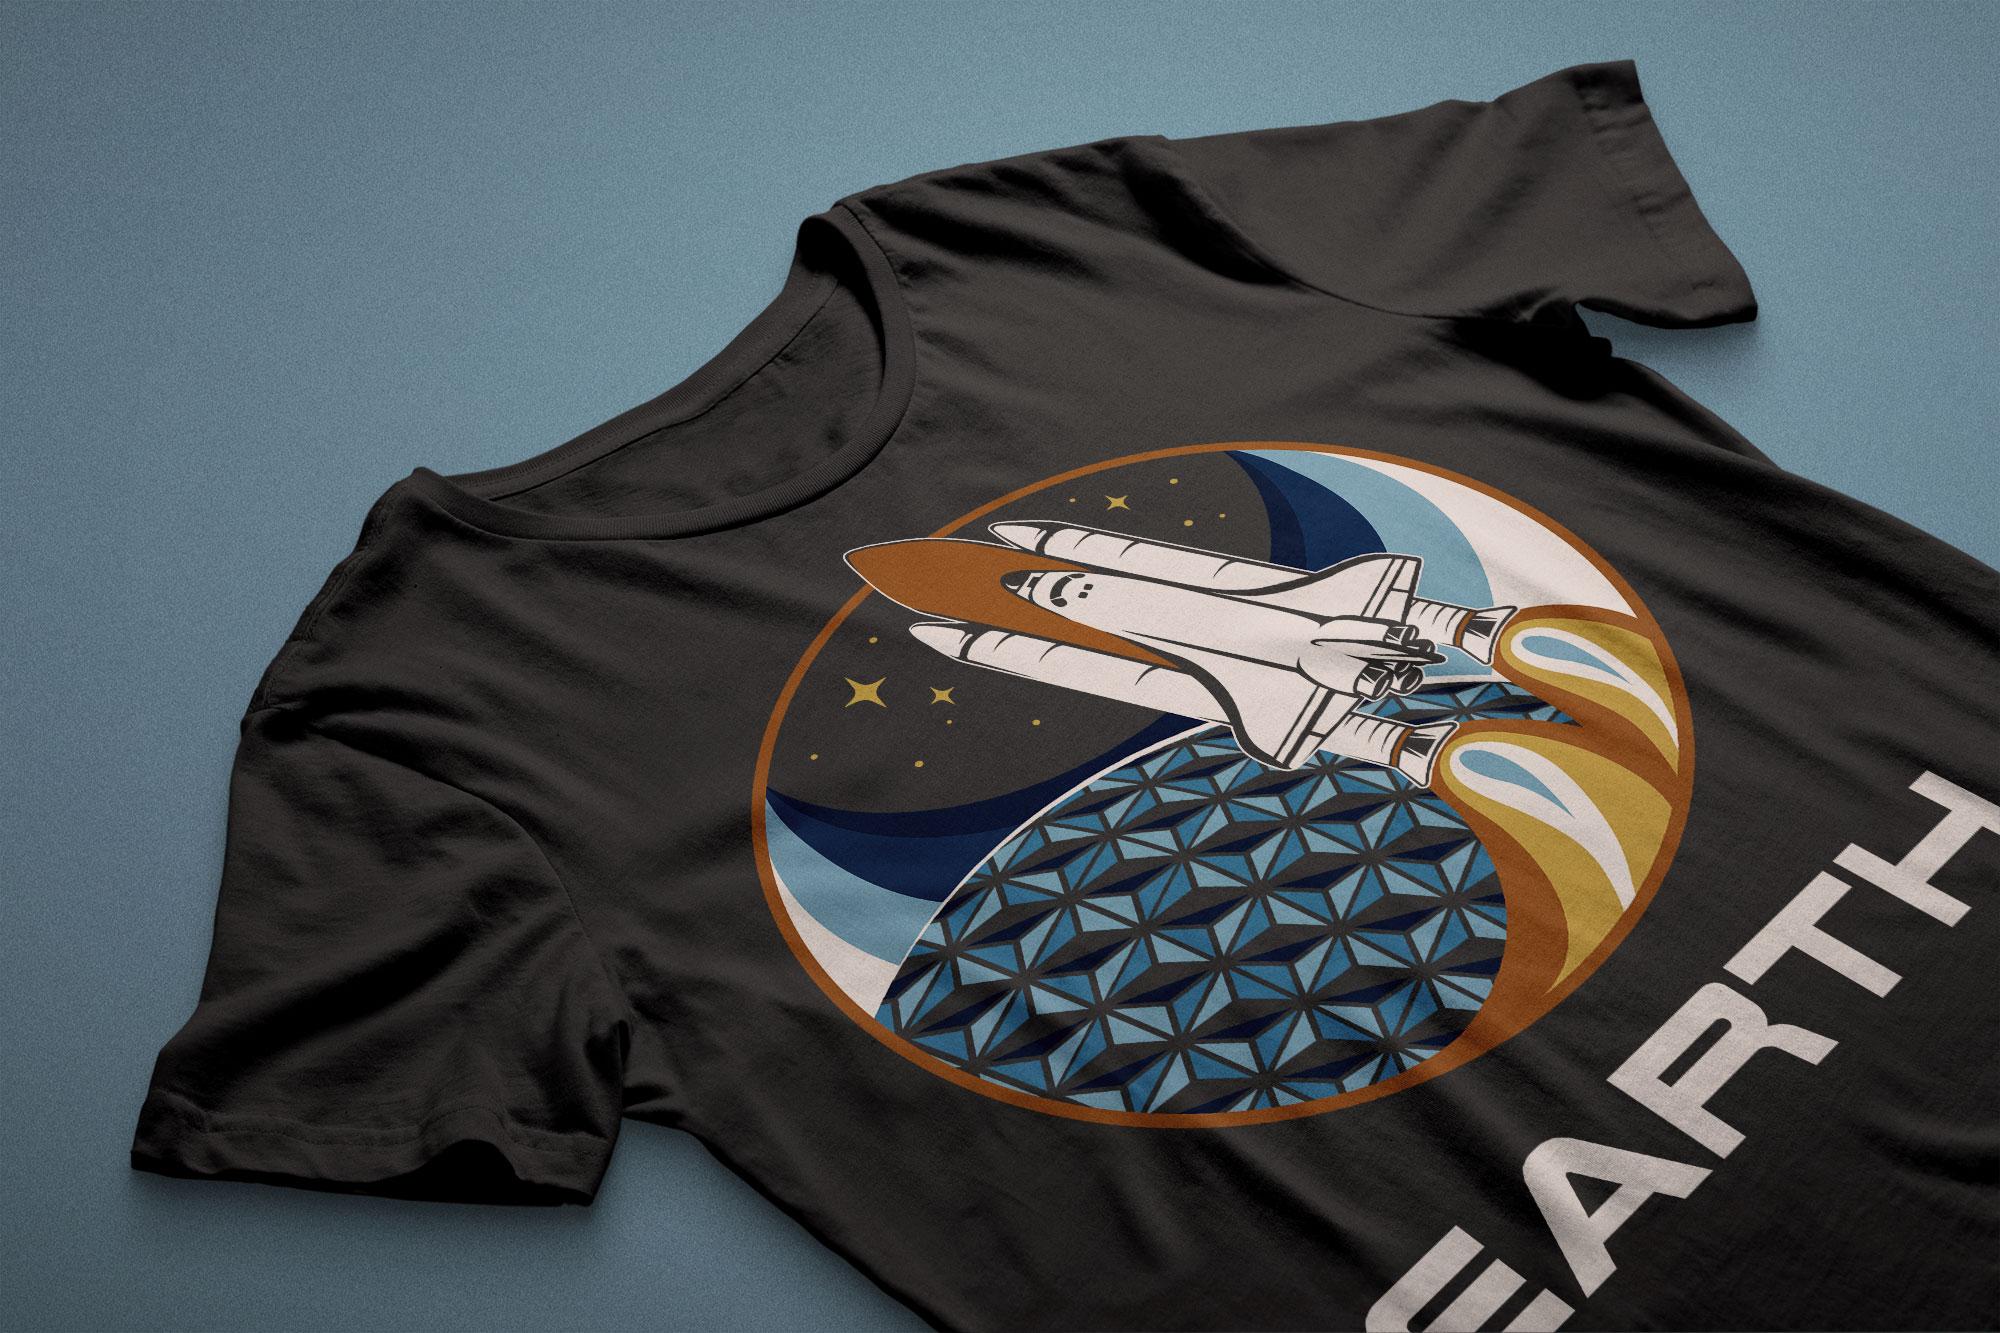 epcott-spaceship-earth-shirt.jpg